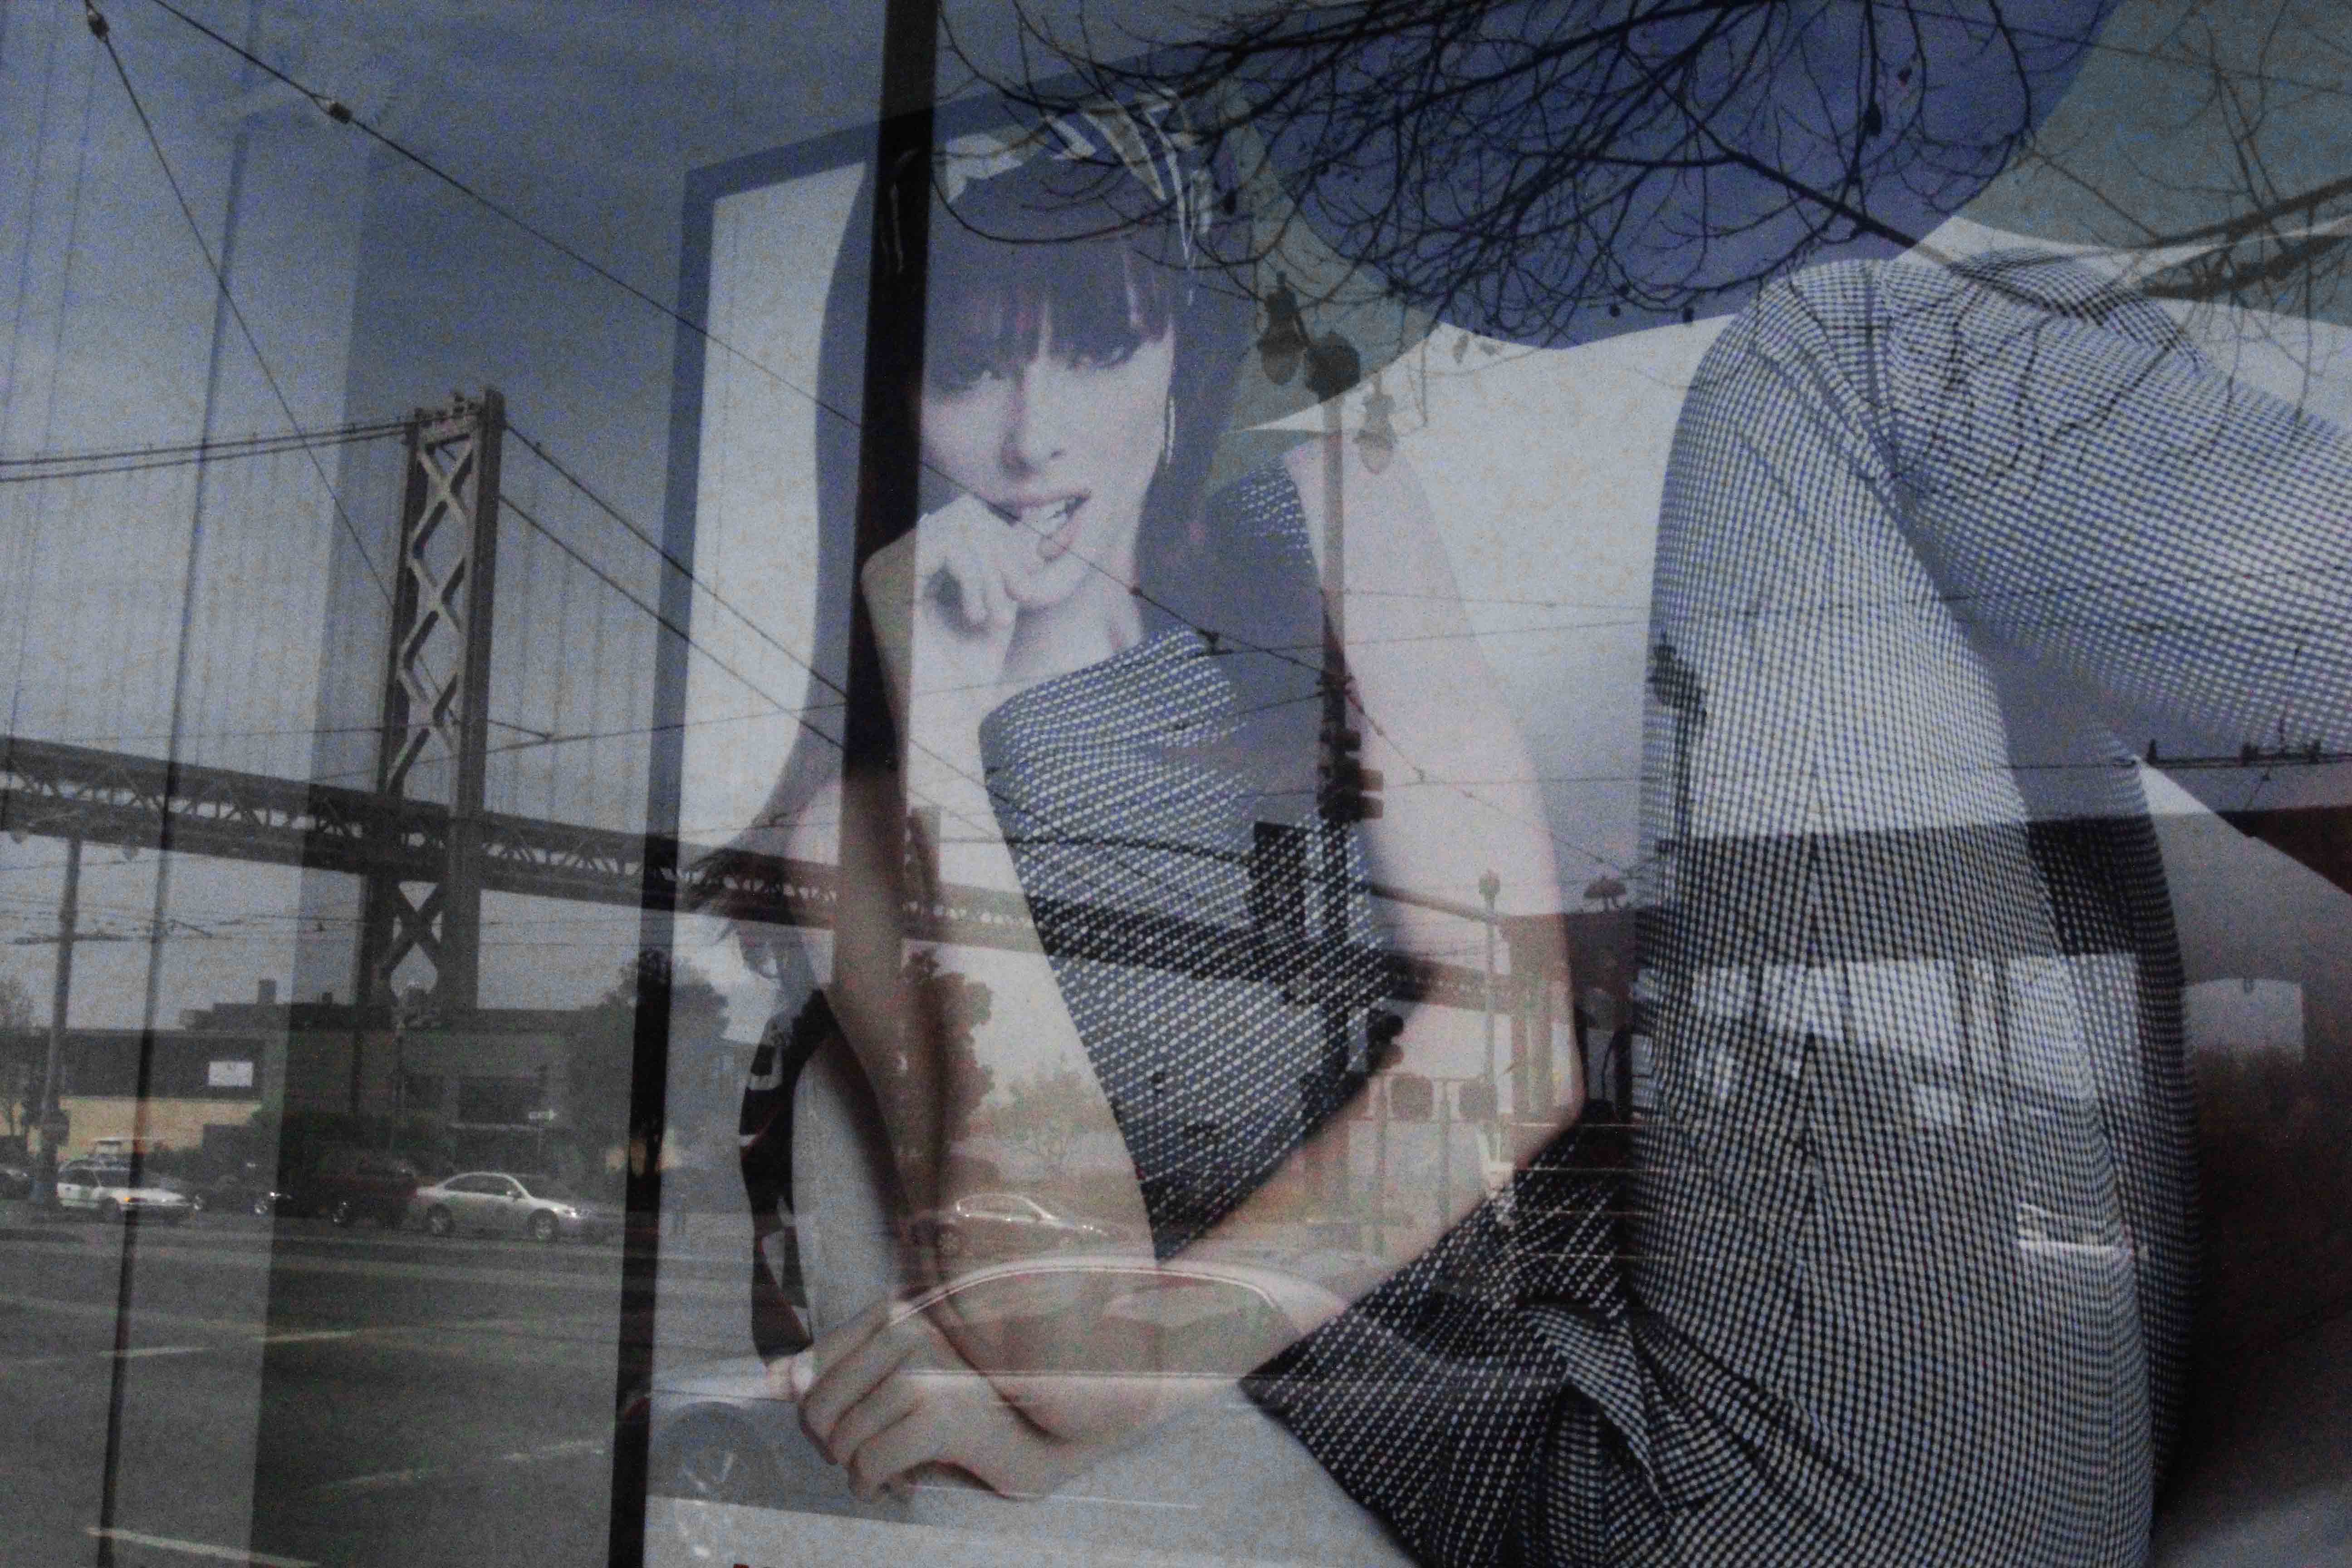 SF ARTISTIC SHOT OF GOLDEN GATE BRIDGE IN REFLECTION